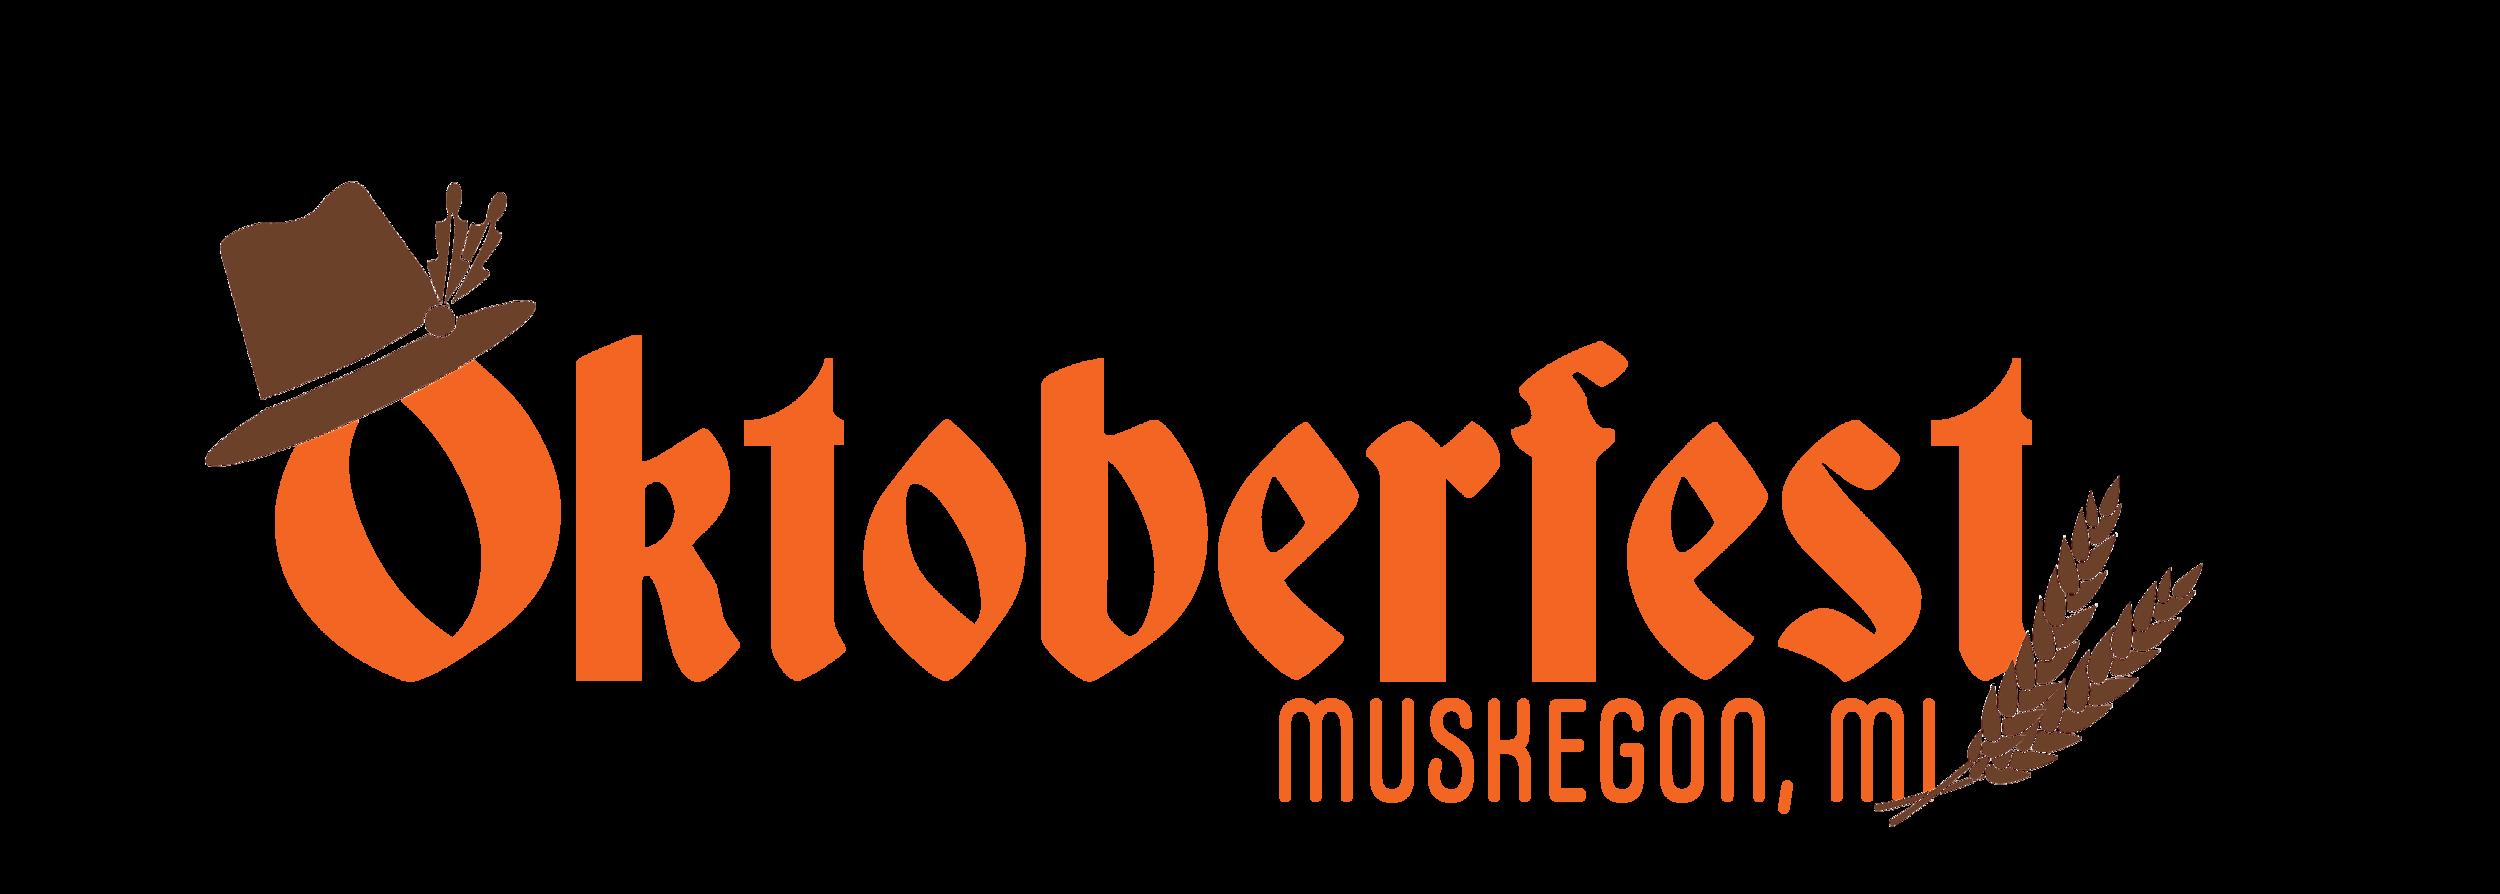 Oktoberfest Final 2 Color.png